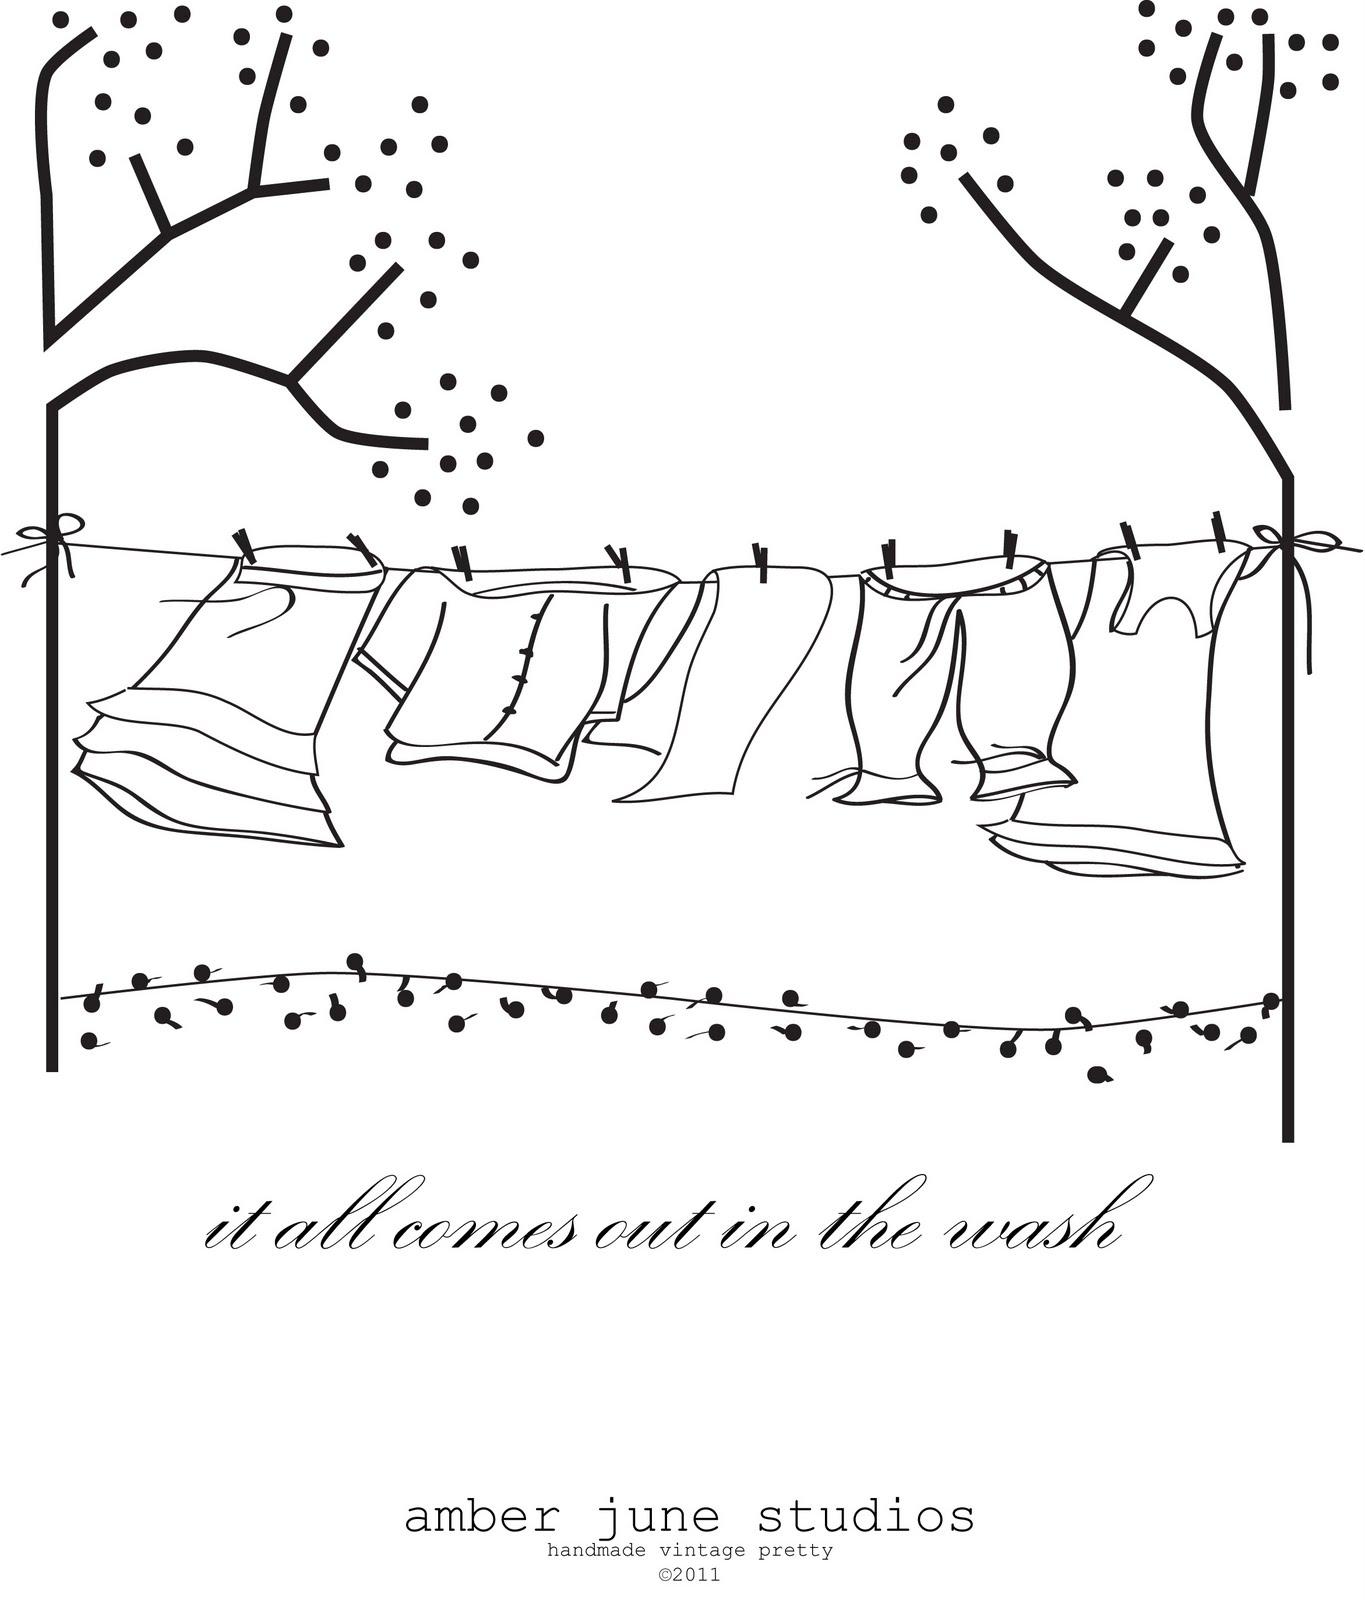 Amber June Studios: Embroidery